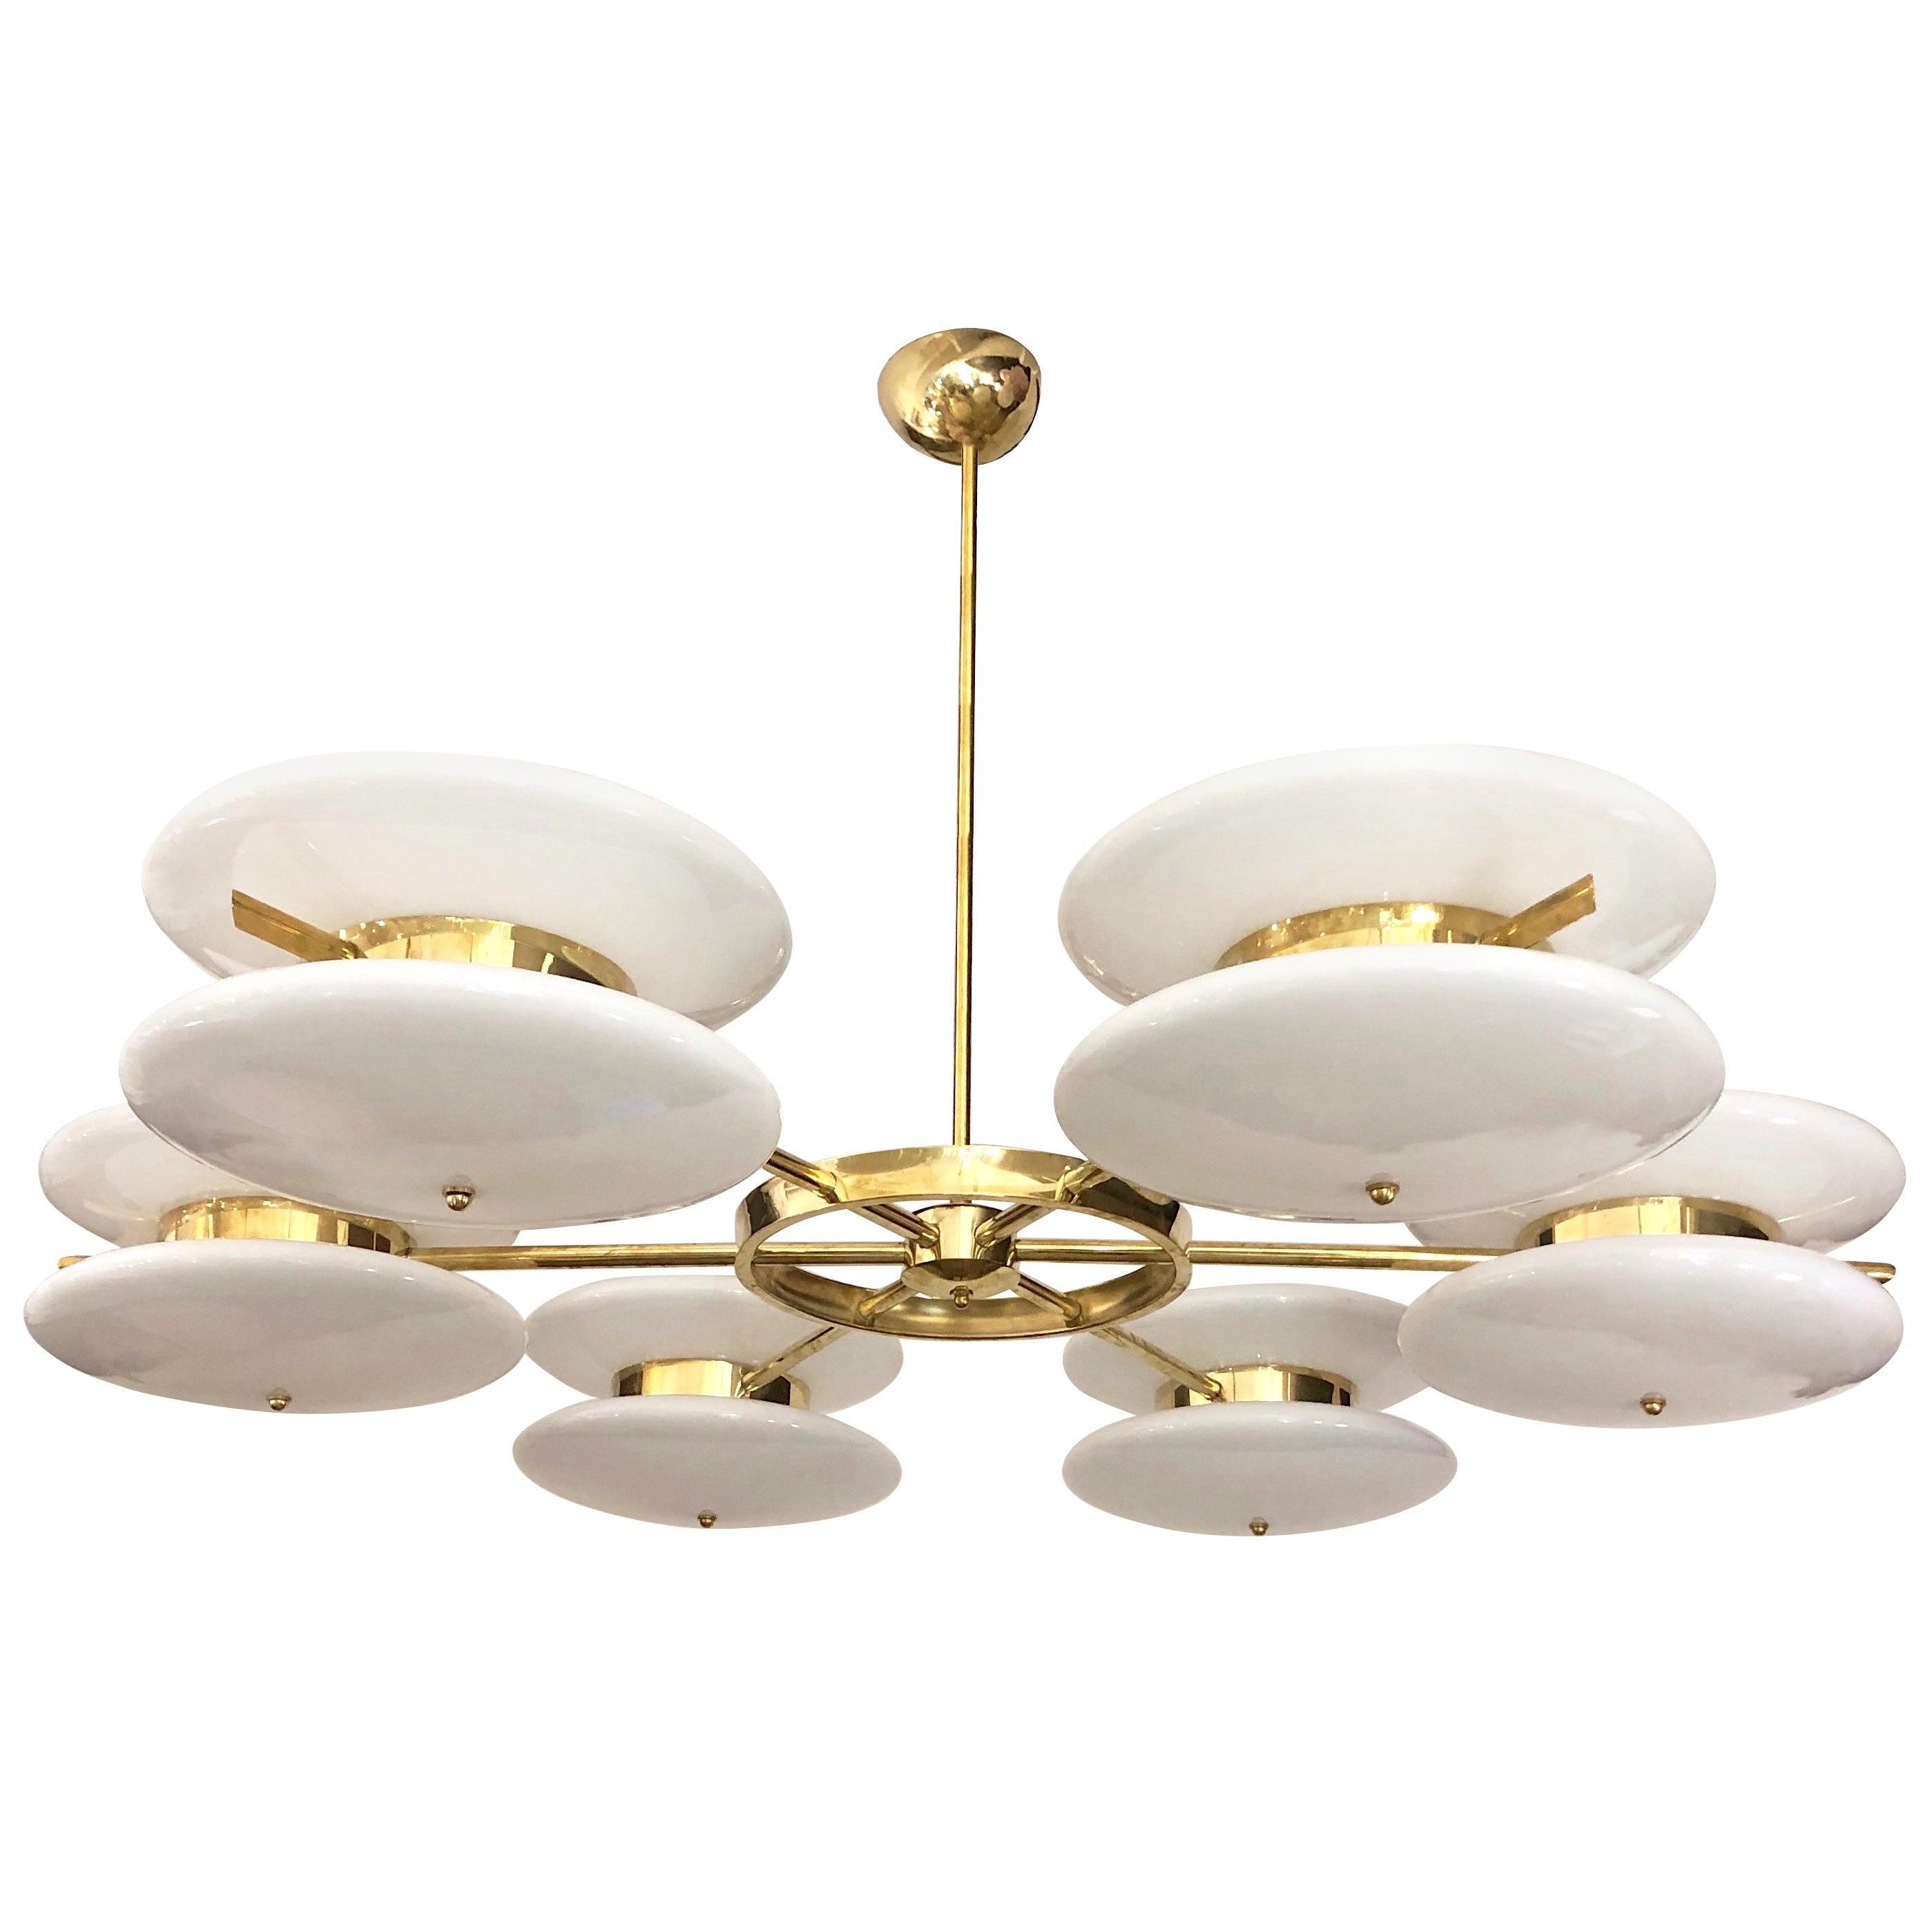 Italian Minimalist Contemporary White Murano Glass and Brass Chandelier